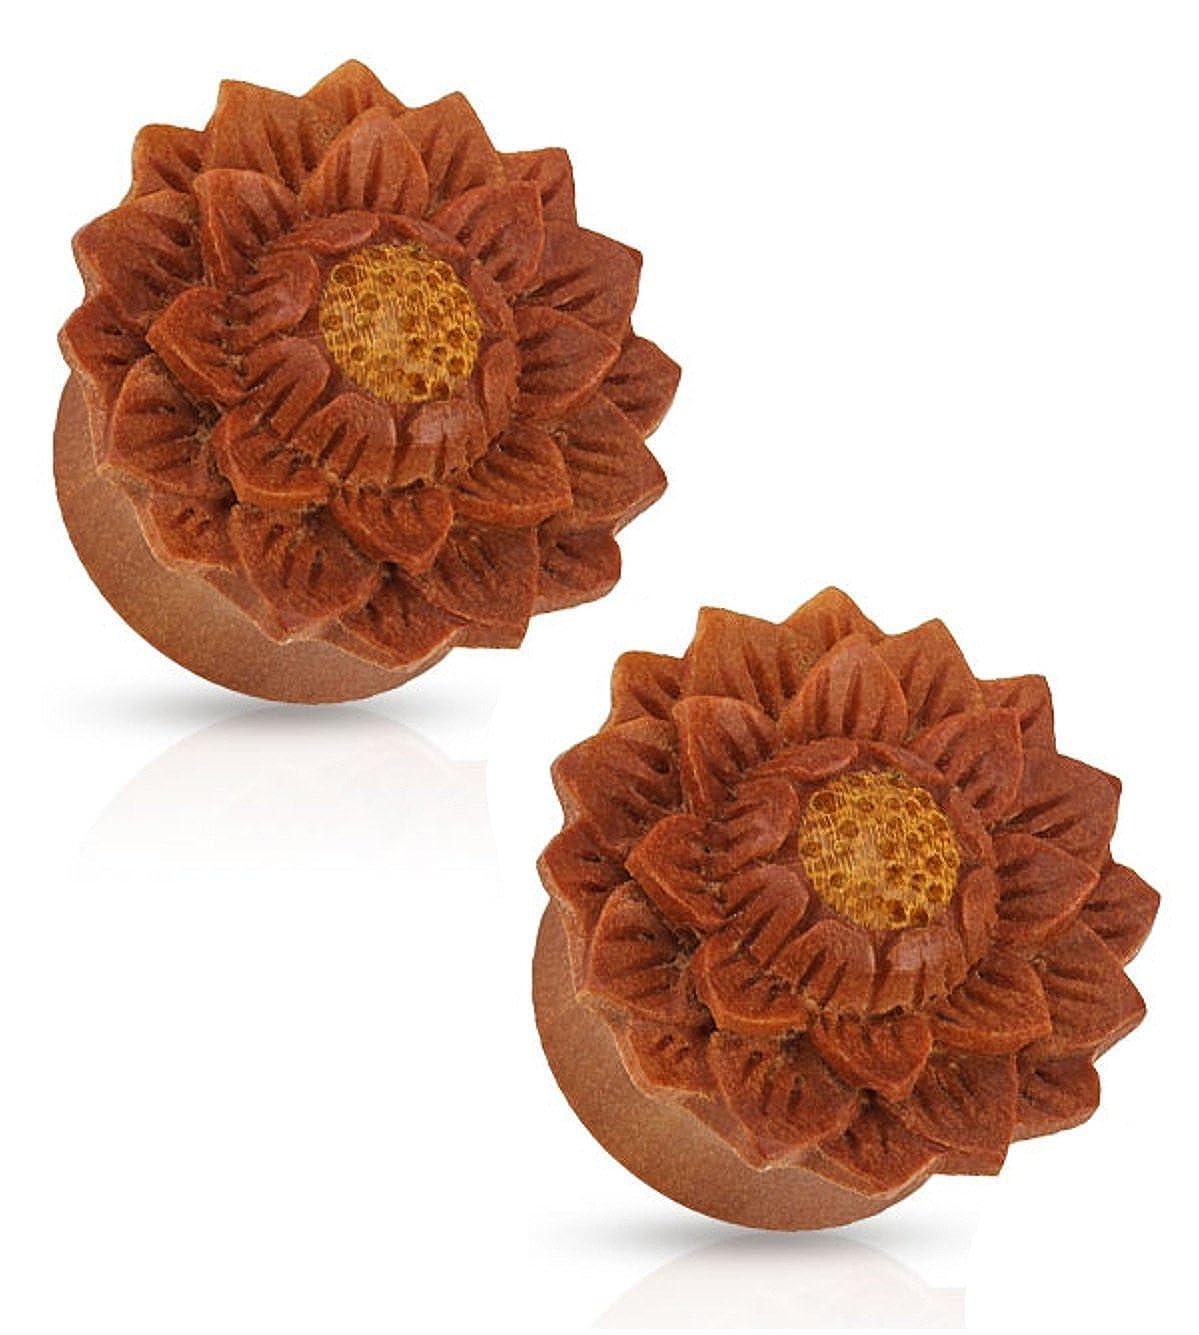 Lotus Flower Hand Carved Organic Jackfruit Tree Saddle Fit Plugs Ear Gauges - Sold As Pair (10mm - 00GA) Pierced Owl n/a